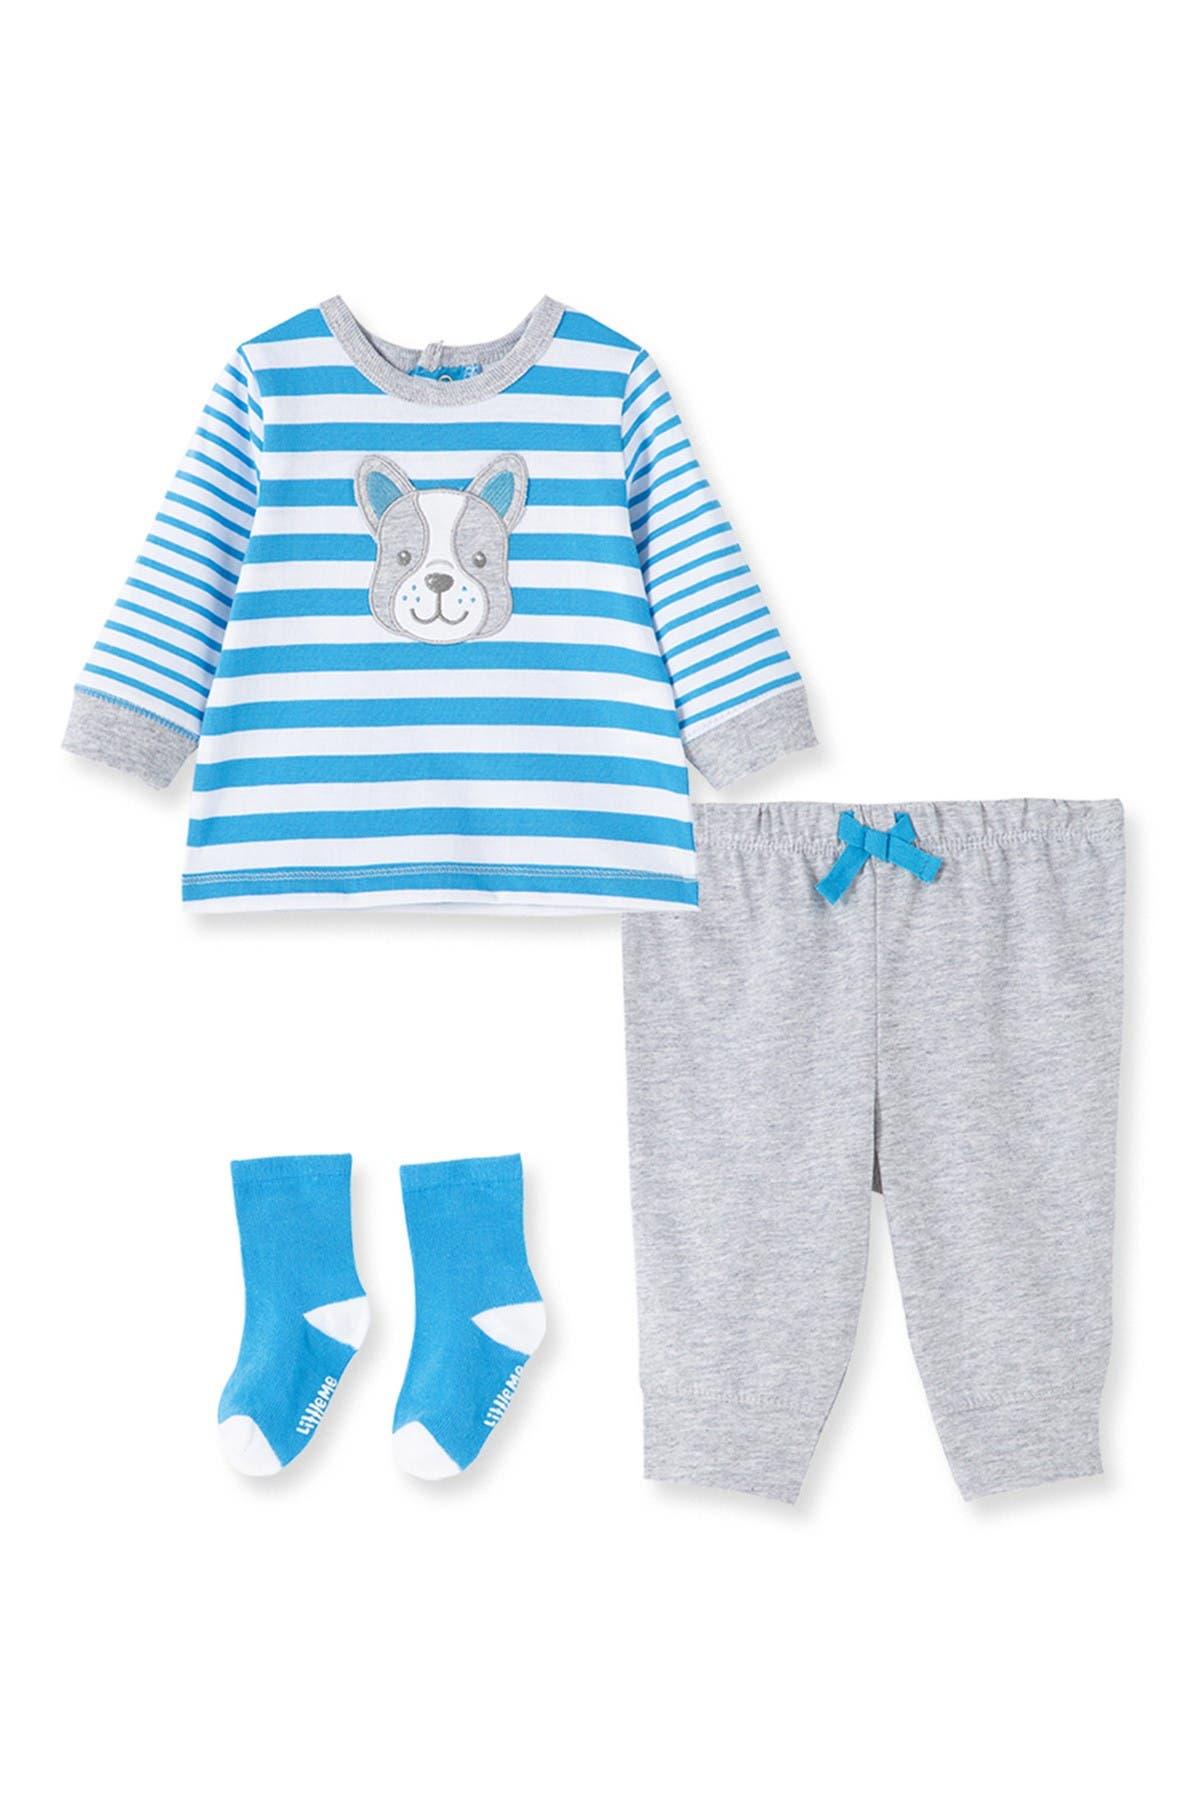 Image of Little Me Doggy Striped Shirt, Joggers, & Socks Set